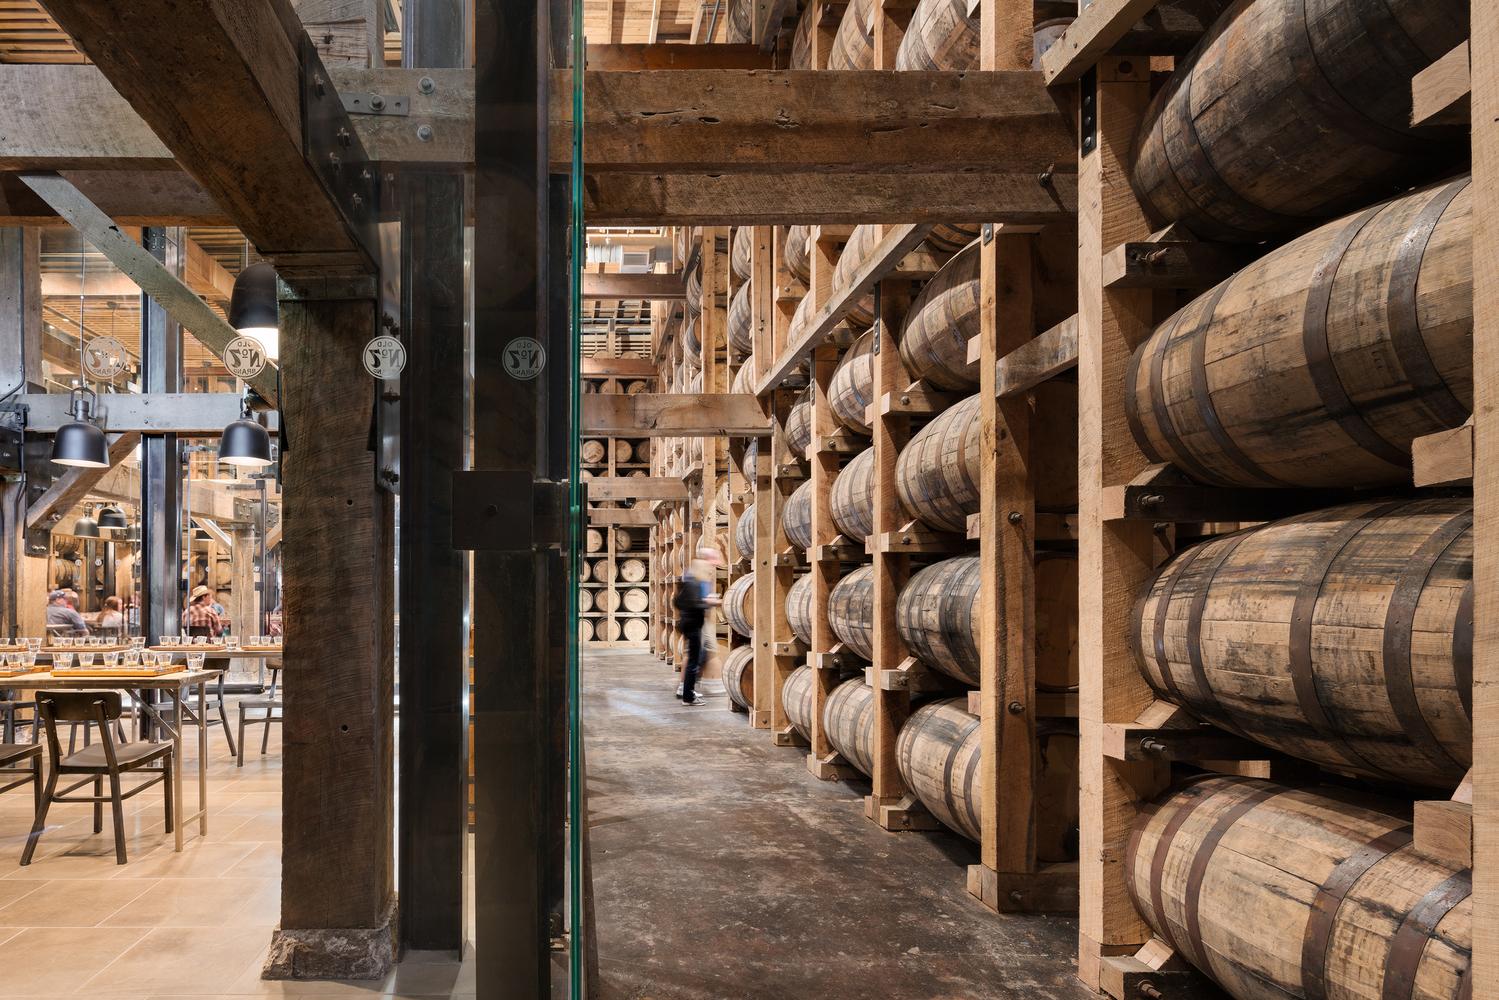 Jack Daniel's Barrel House in Tennessee